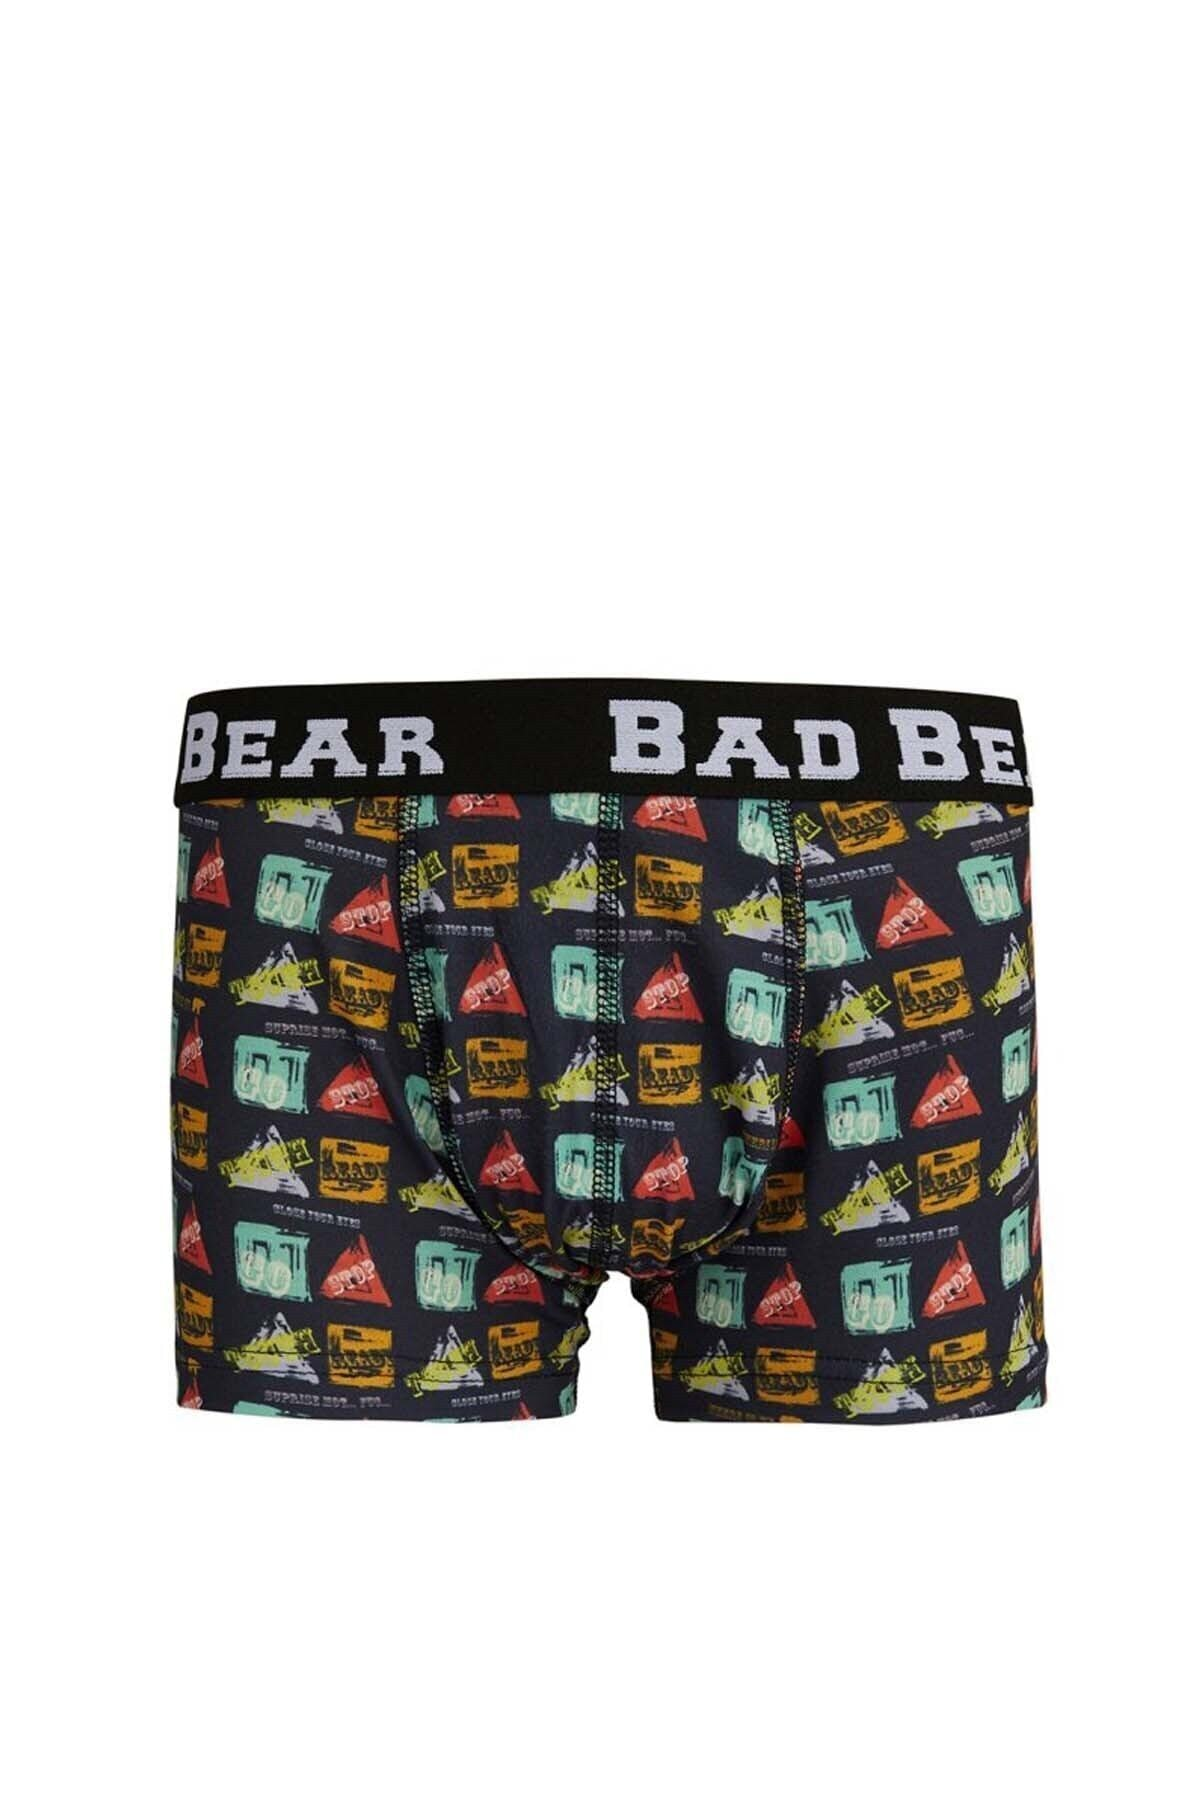 Bad Bear Sıgnal Uw Erkek Boxer 20.01.03.005raven 2